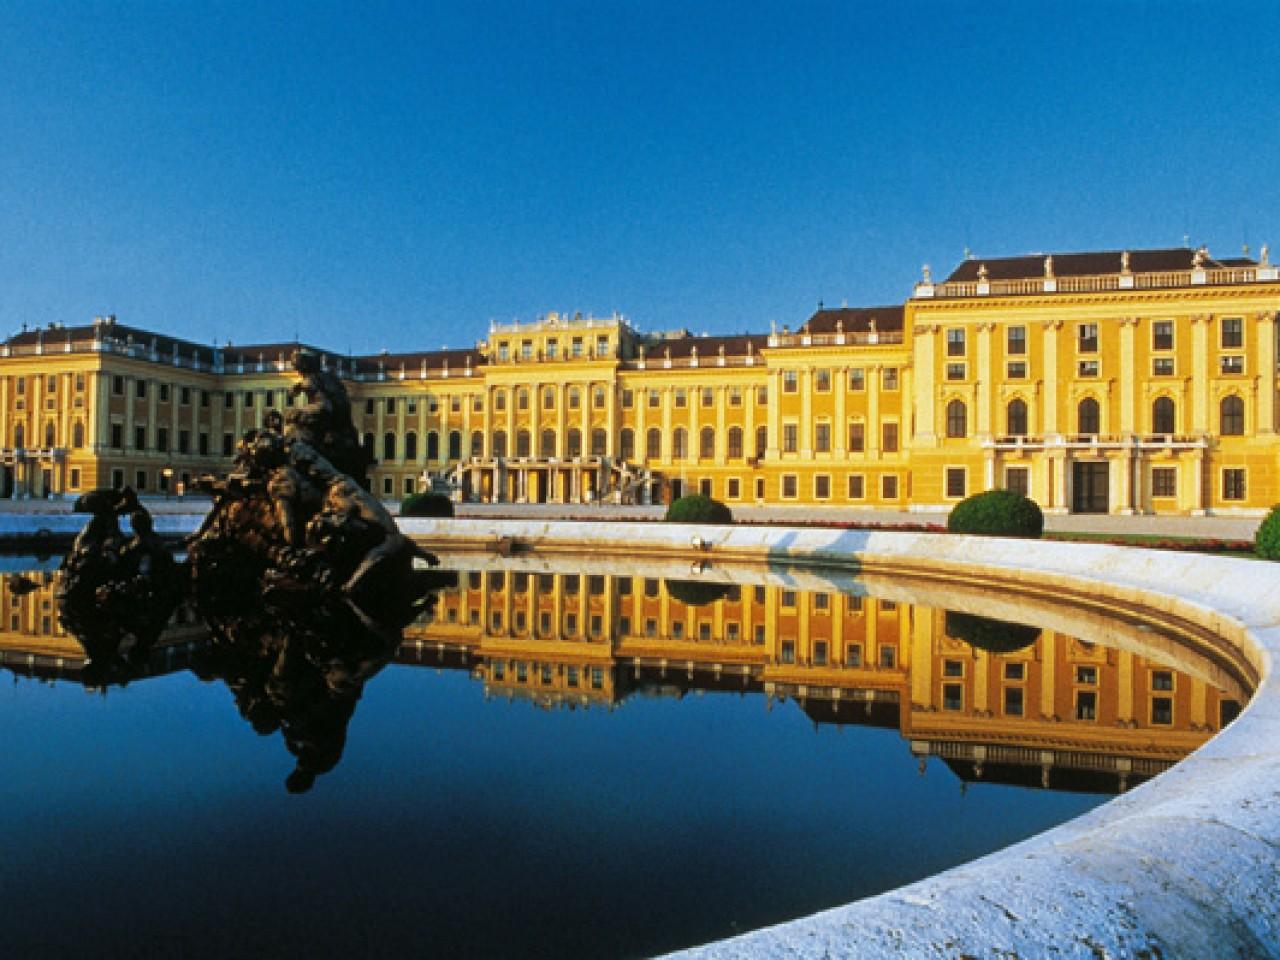 Orangery at the Schonbrunn Palace